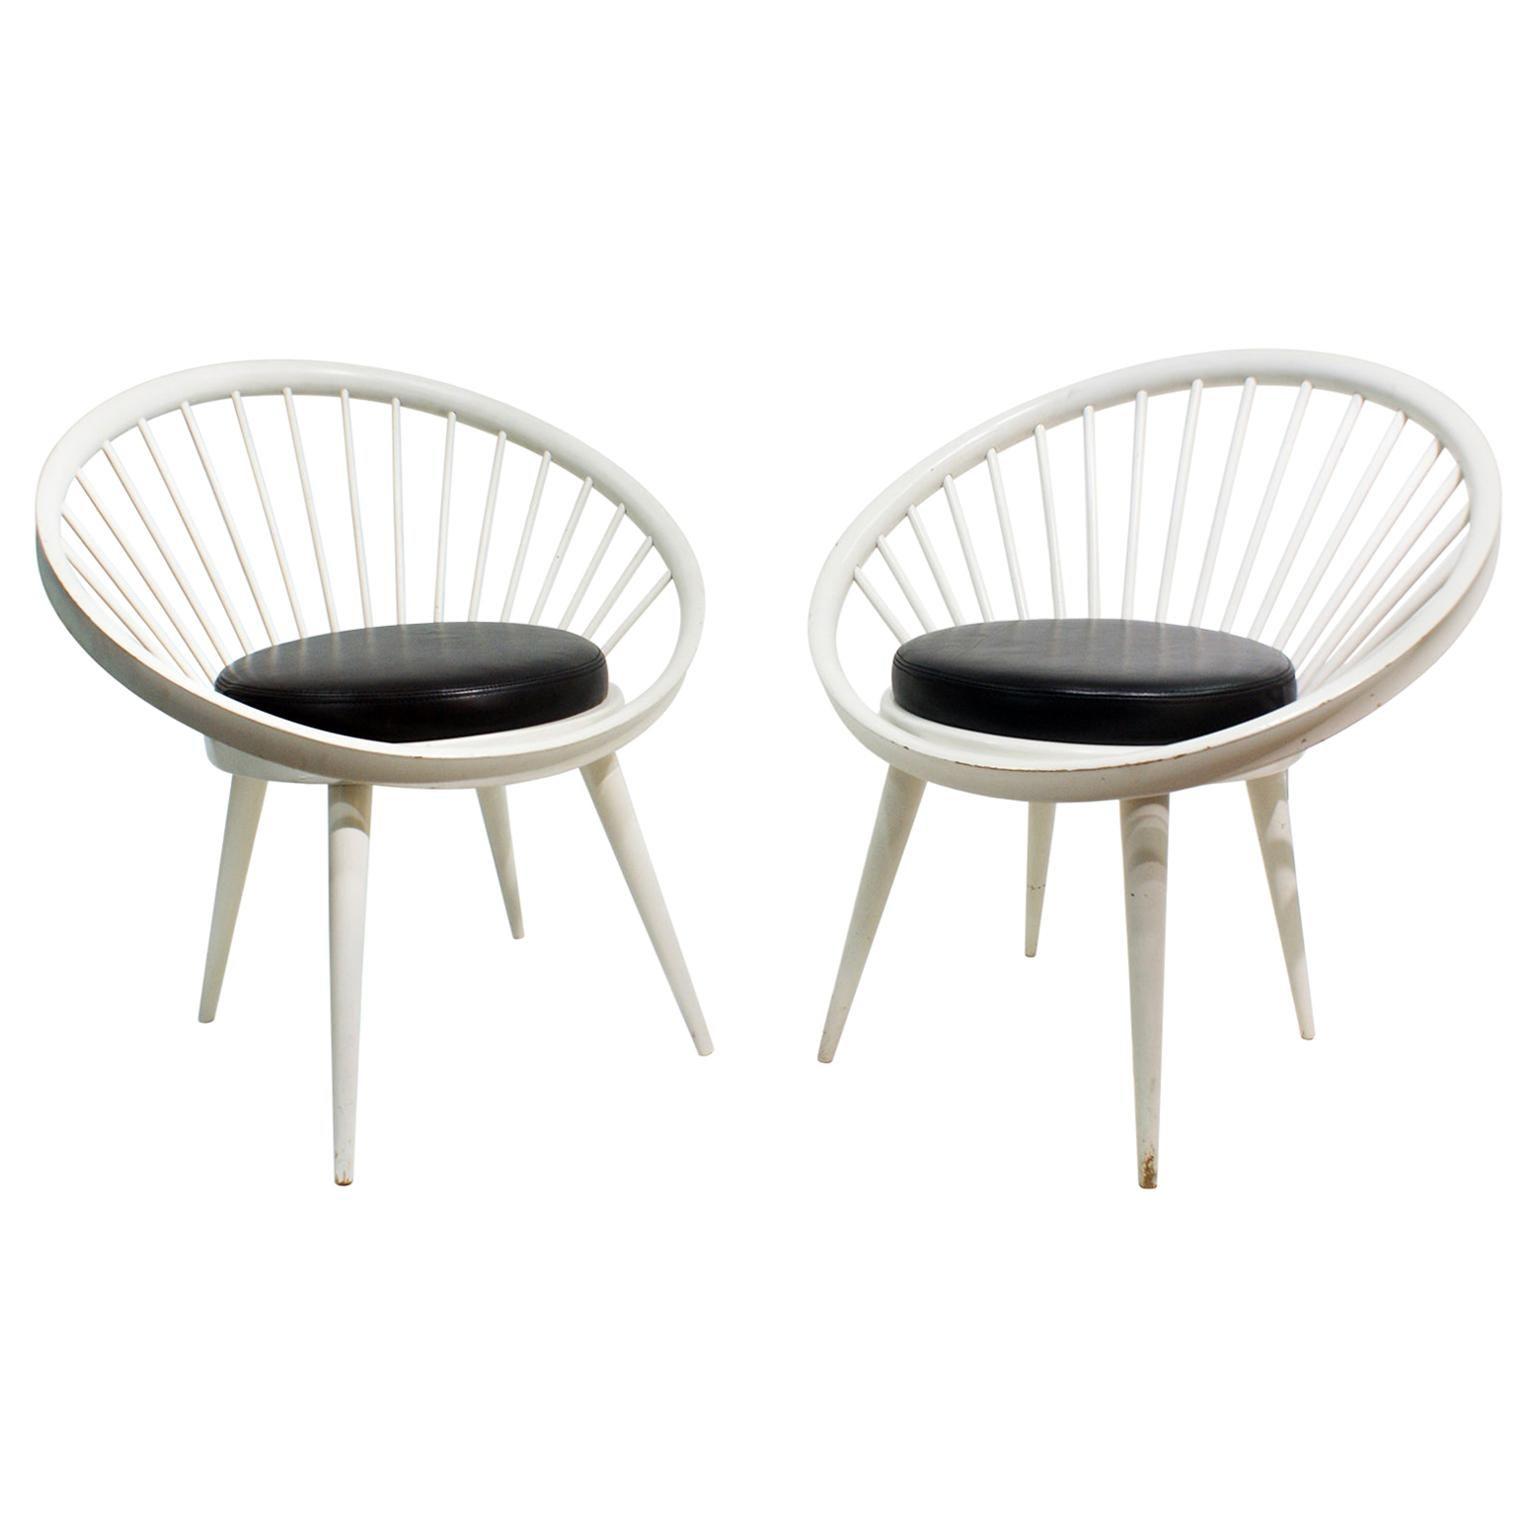 Pair of Round Chair by Yngve Ekstrom, 1960